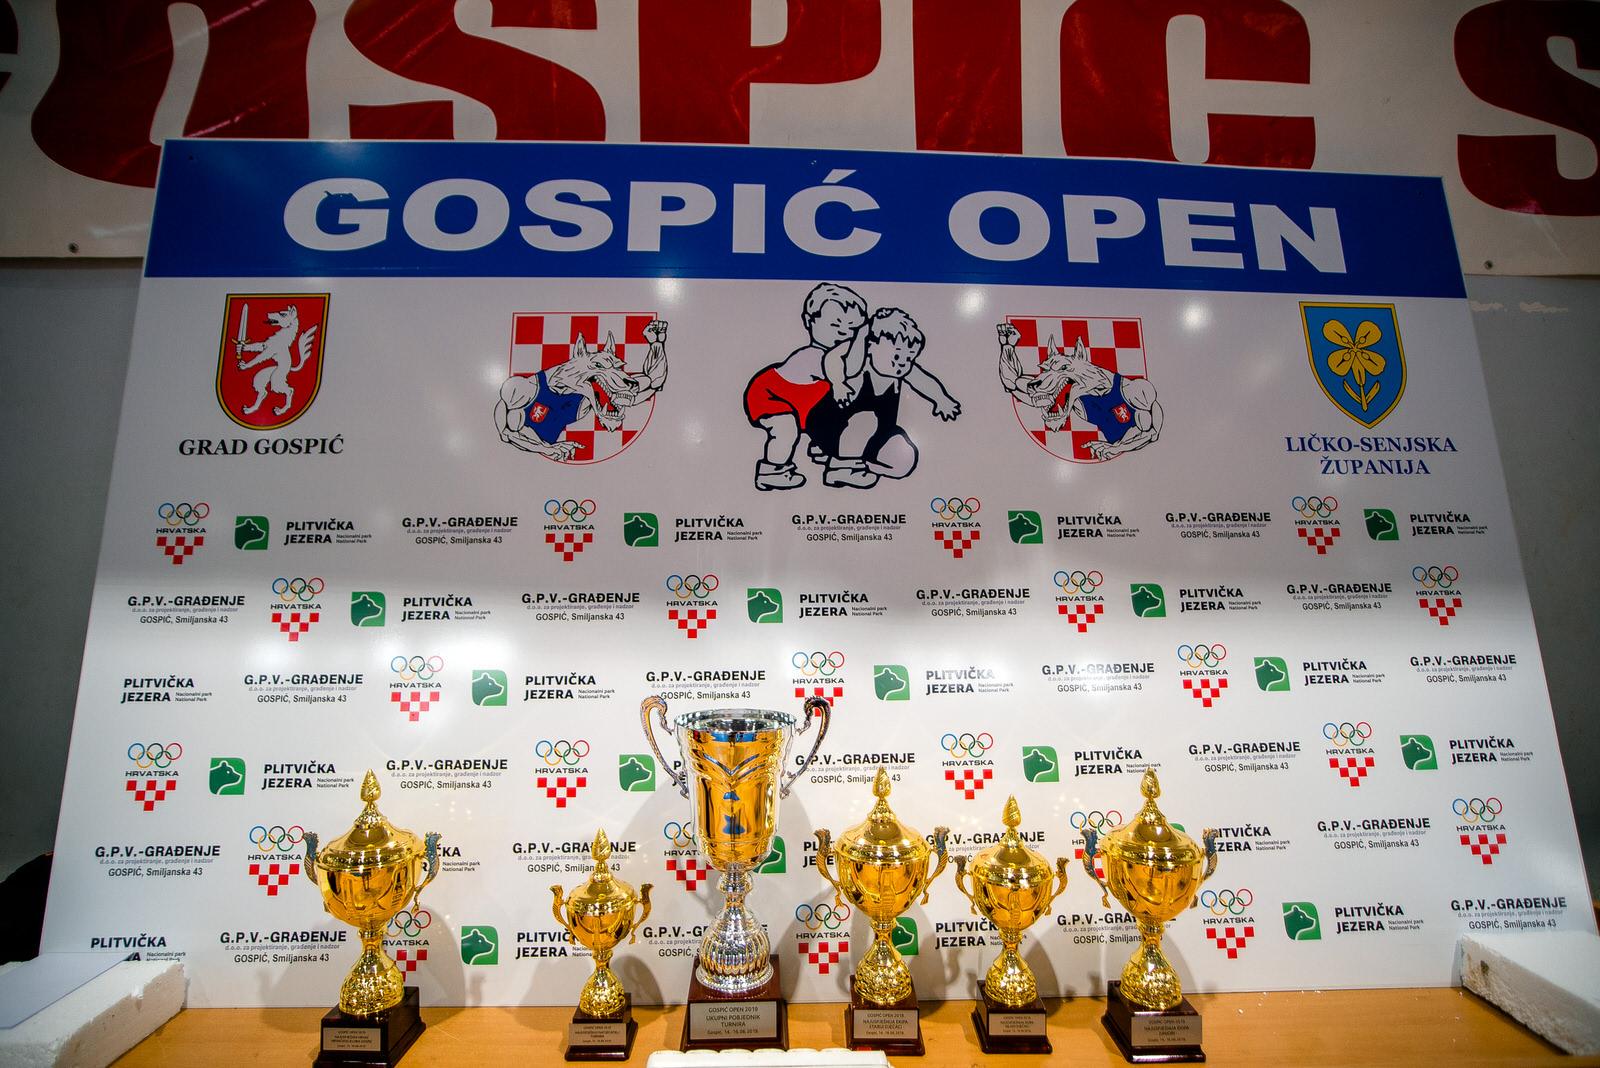 likaclub_gospić-open-hrvanje_2019-9